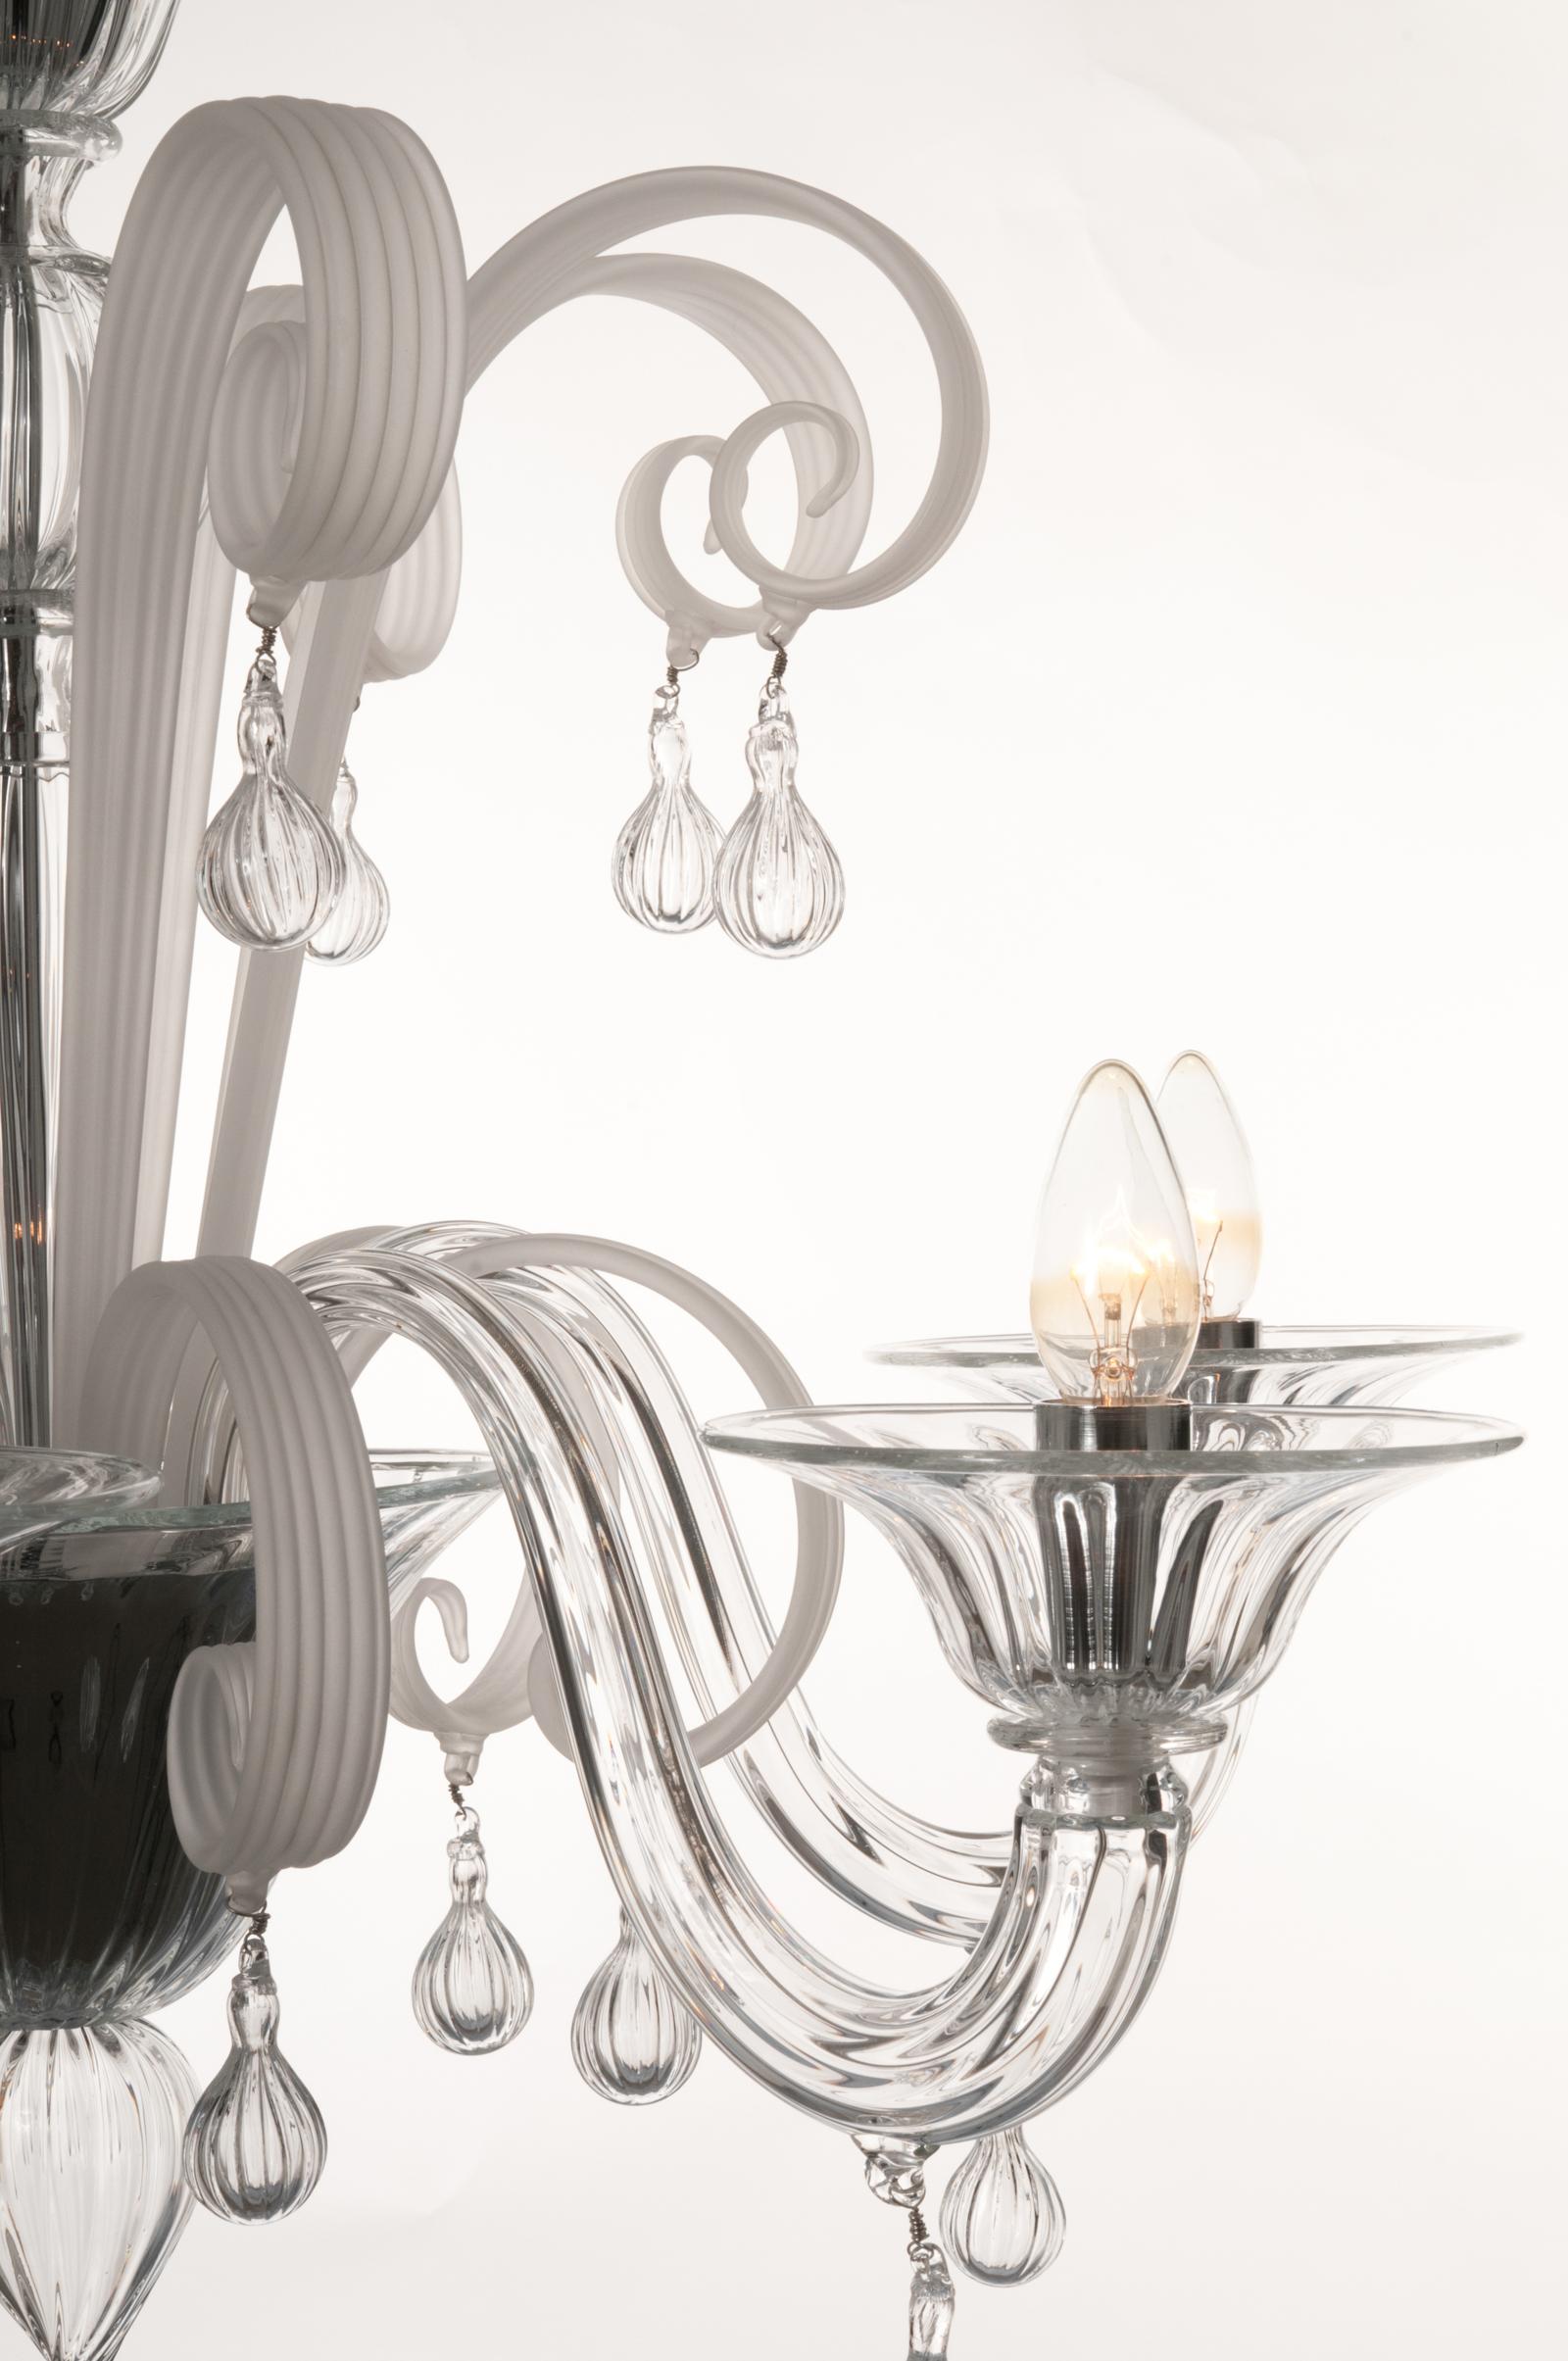 Soie-lustre-chandelier-veronese-3.jpg